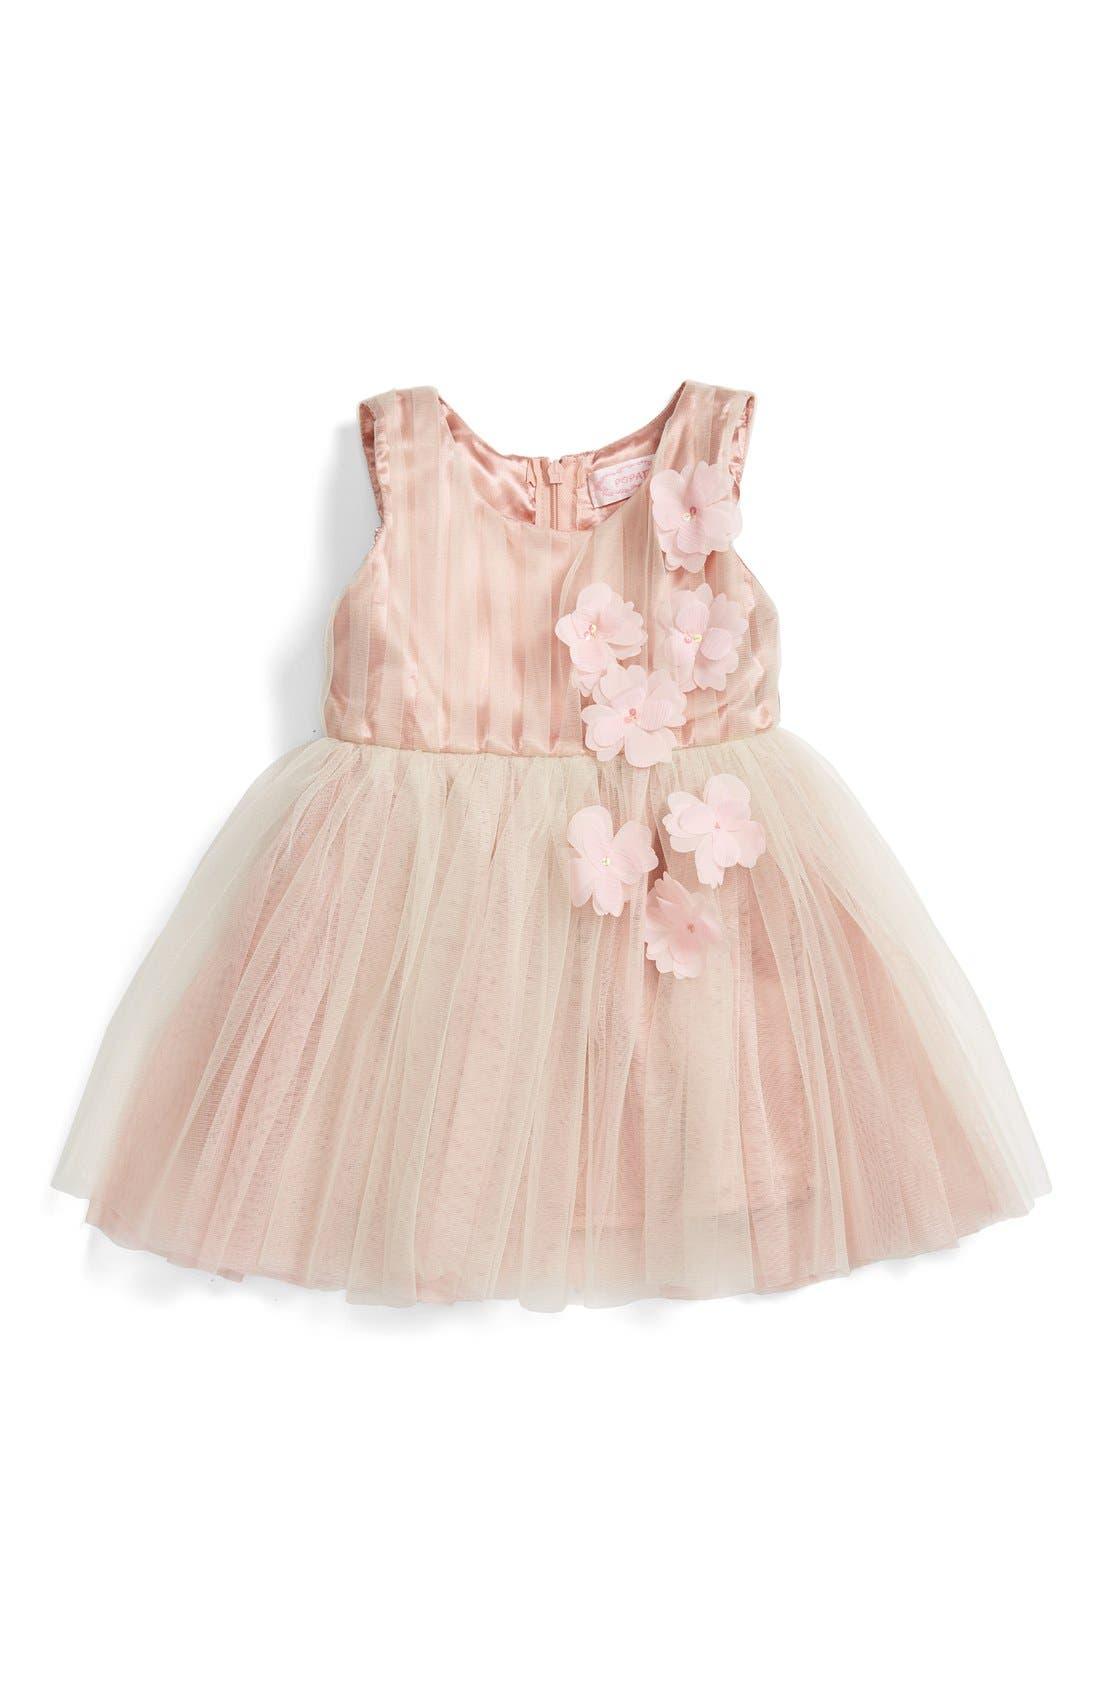 POPATU, Sleeveless Rosette Tulle Dress, Main thumbnail 1, color, TAUPE